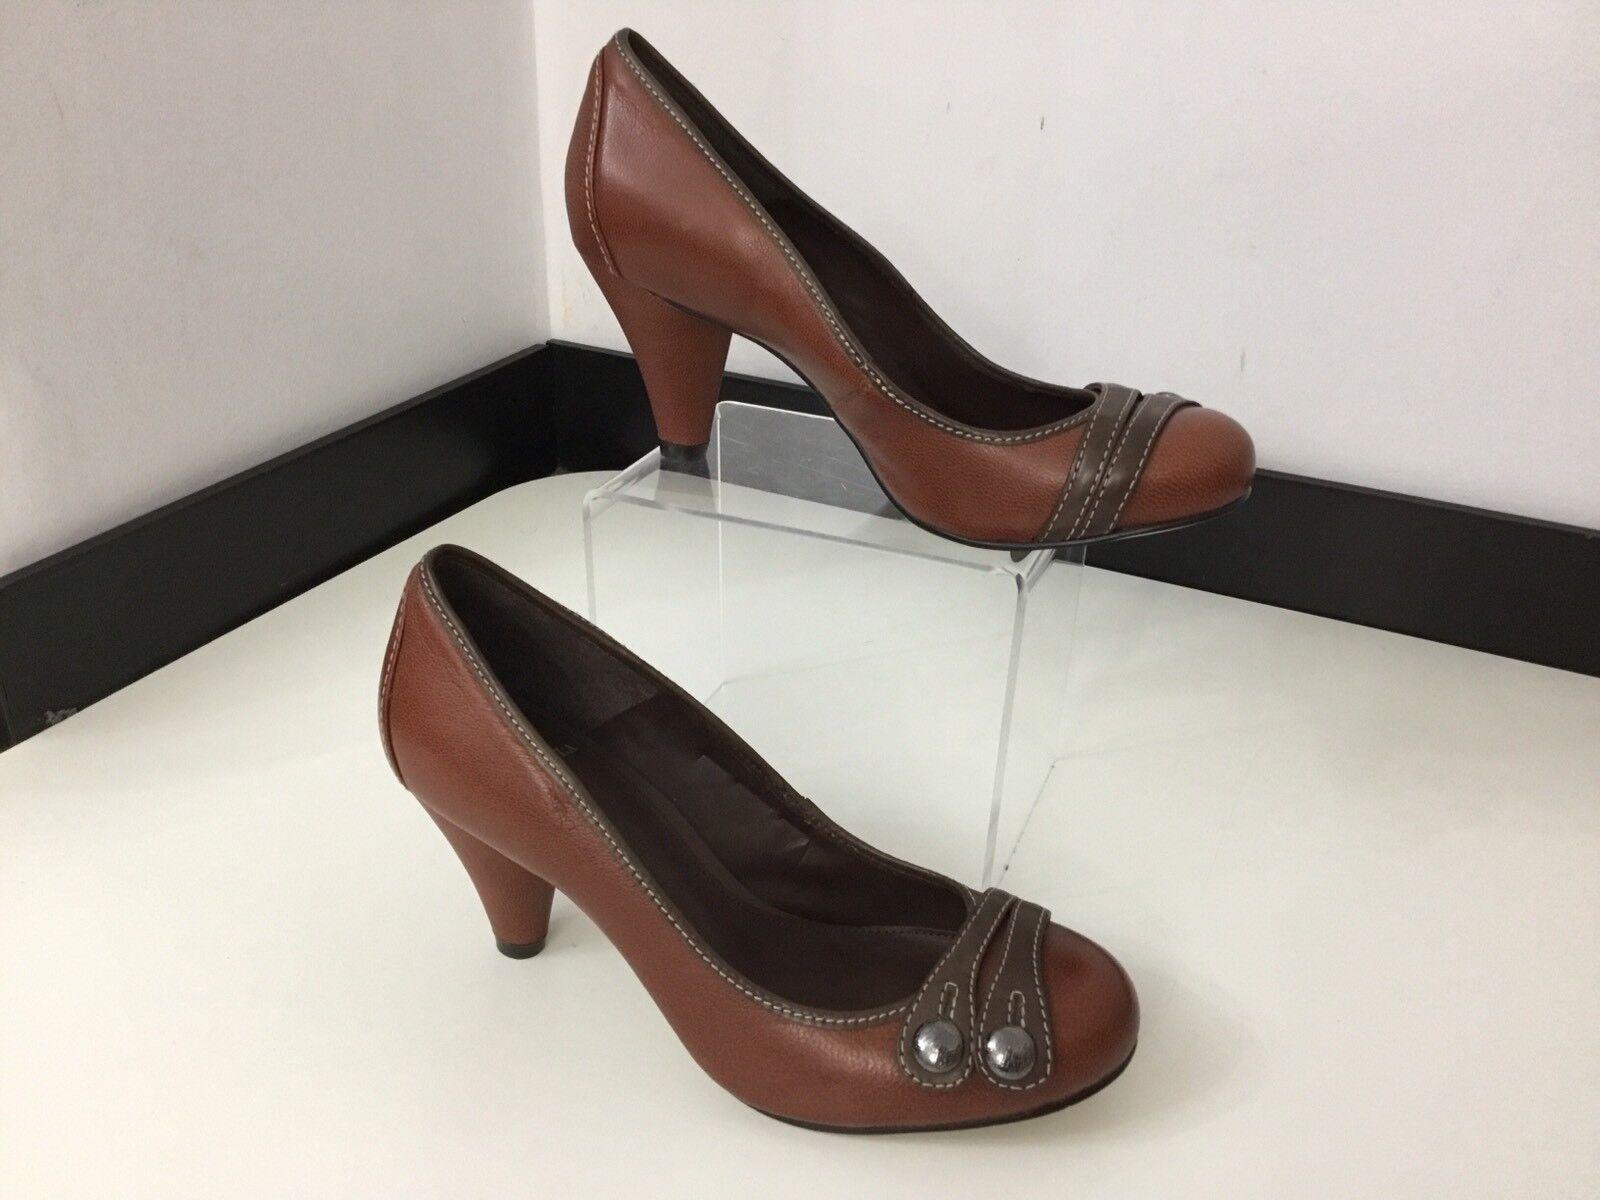 CARVELA By Kurt Geiger Kg NEW BNWOB brown Leather Court shoes Heels Size 37 Uk 4